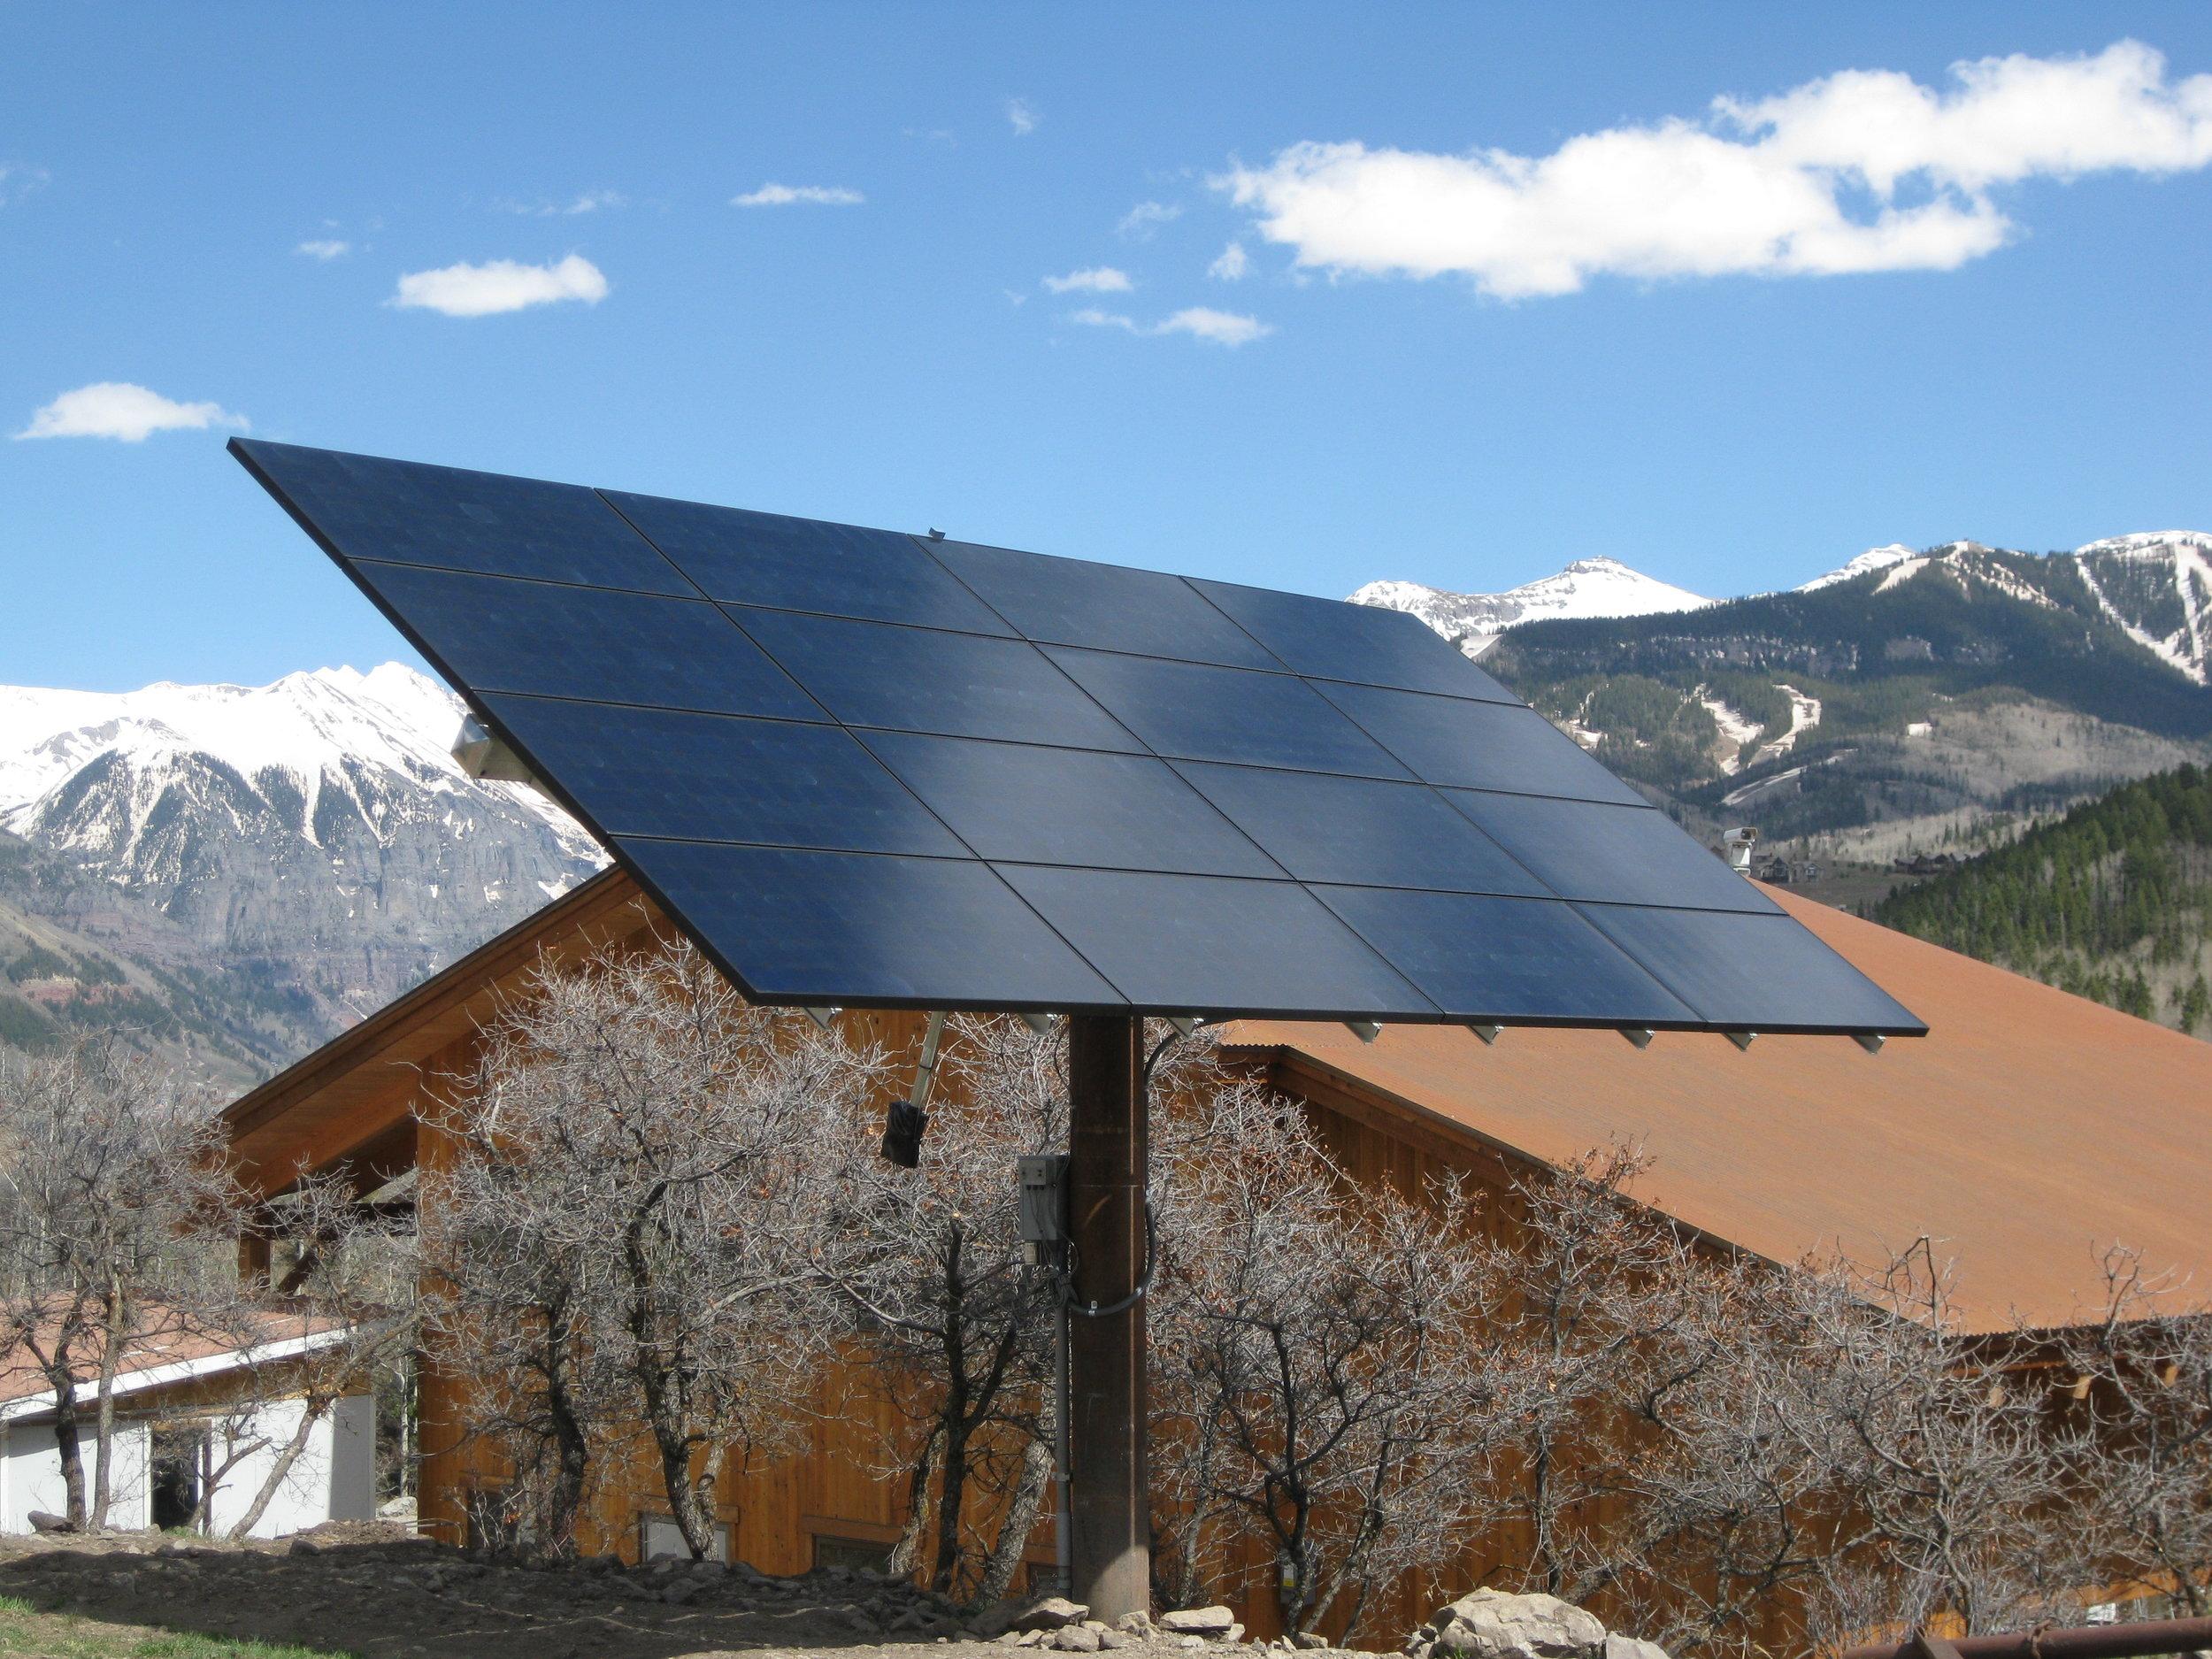 alternative-power-enterprises-solar-installation-projects4.jpg